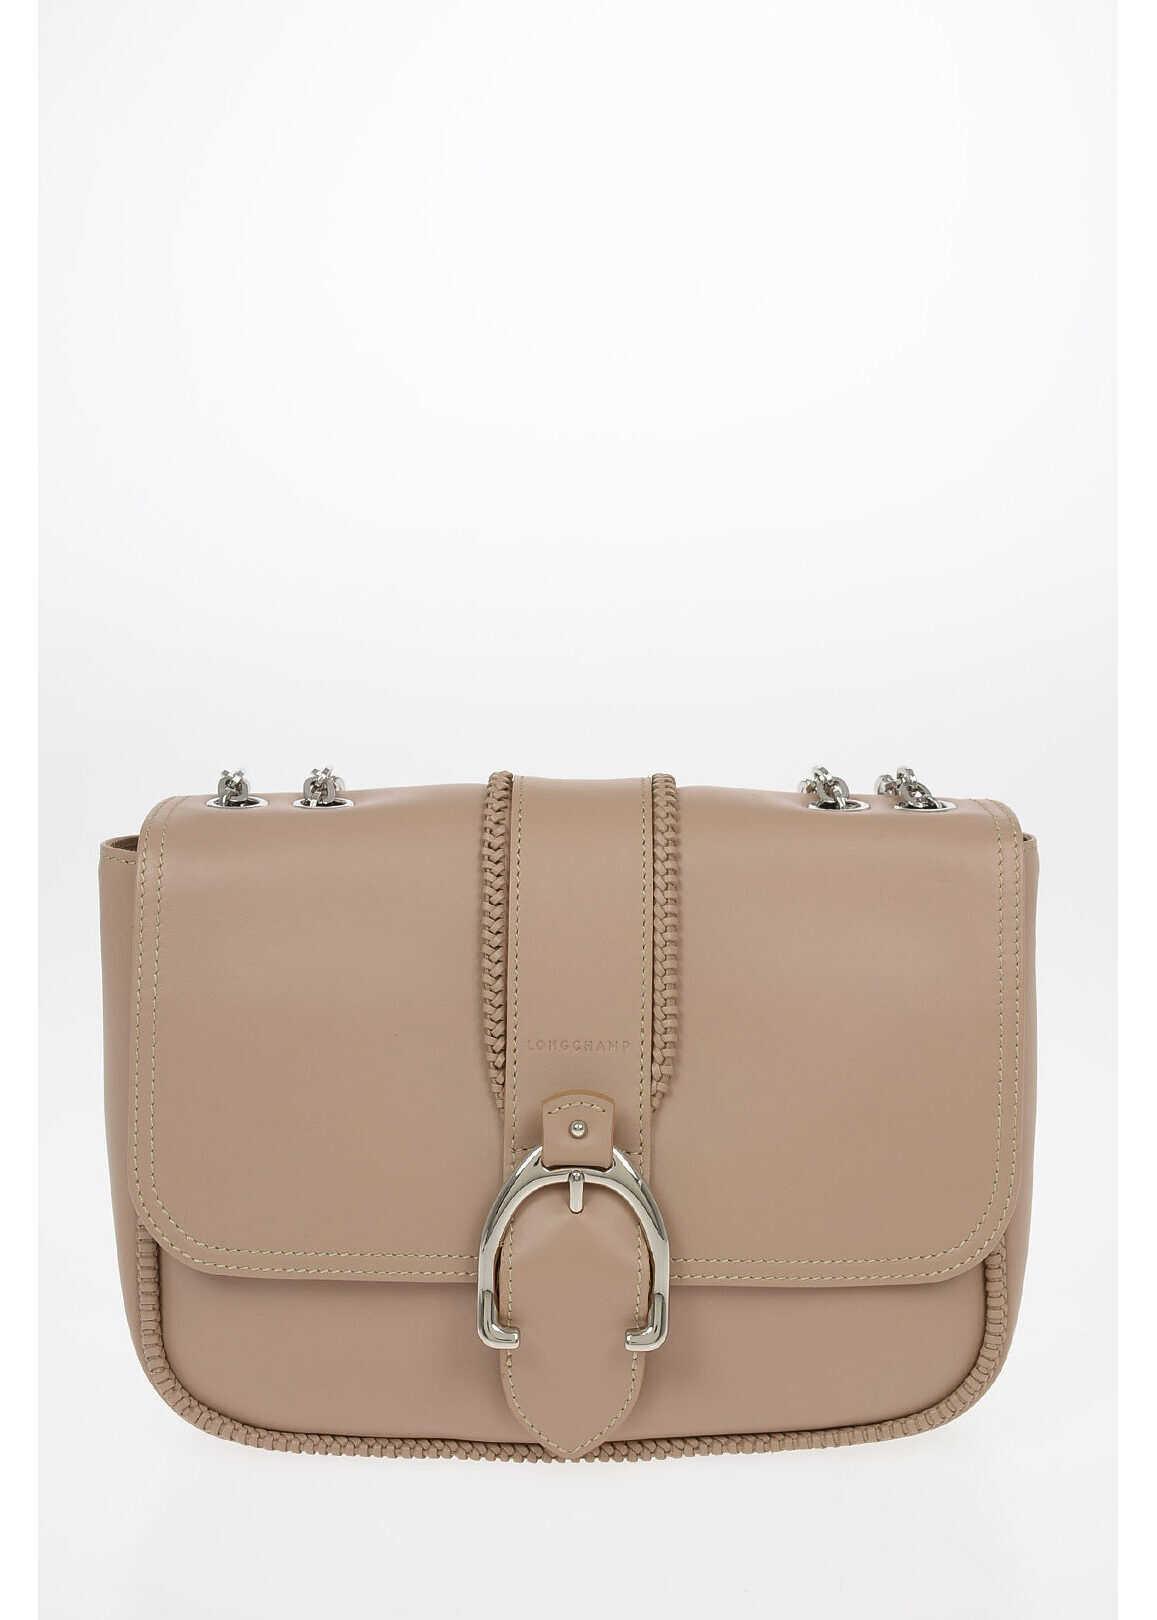 Longchamp Leather Saddle Bag With Adjustable Shoulder Strap BEIGE imagine b-mall.ro